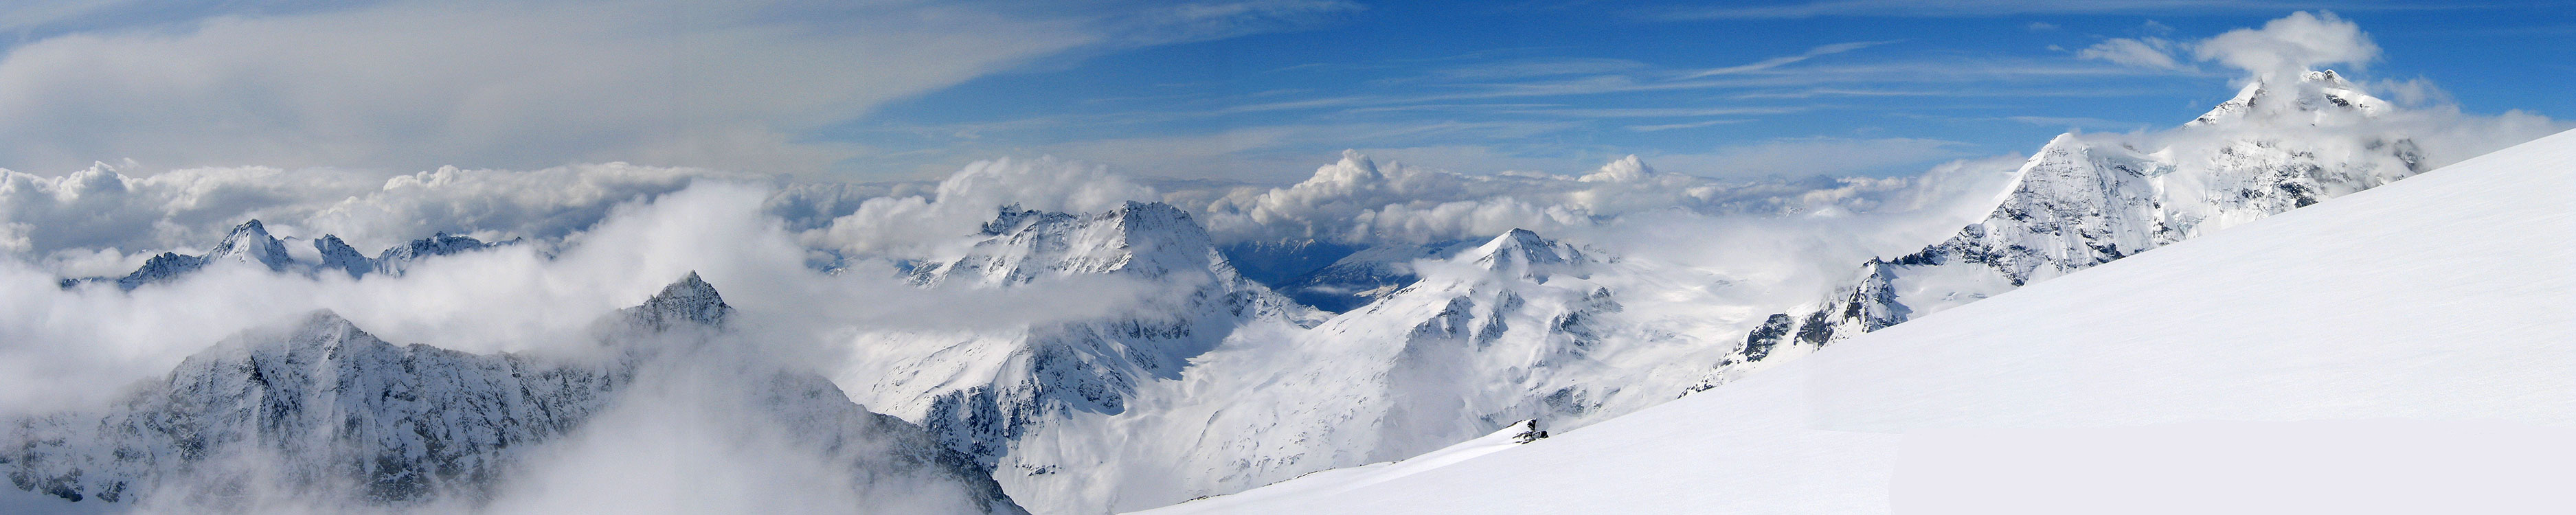 La Ruinette Walliser Alpen / Alpes valaisannes Švýcarsko panorama 29